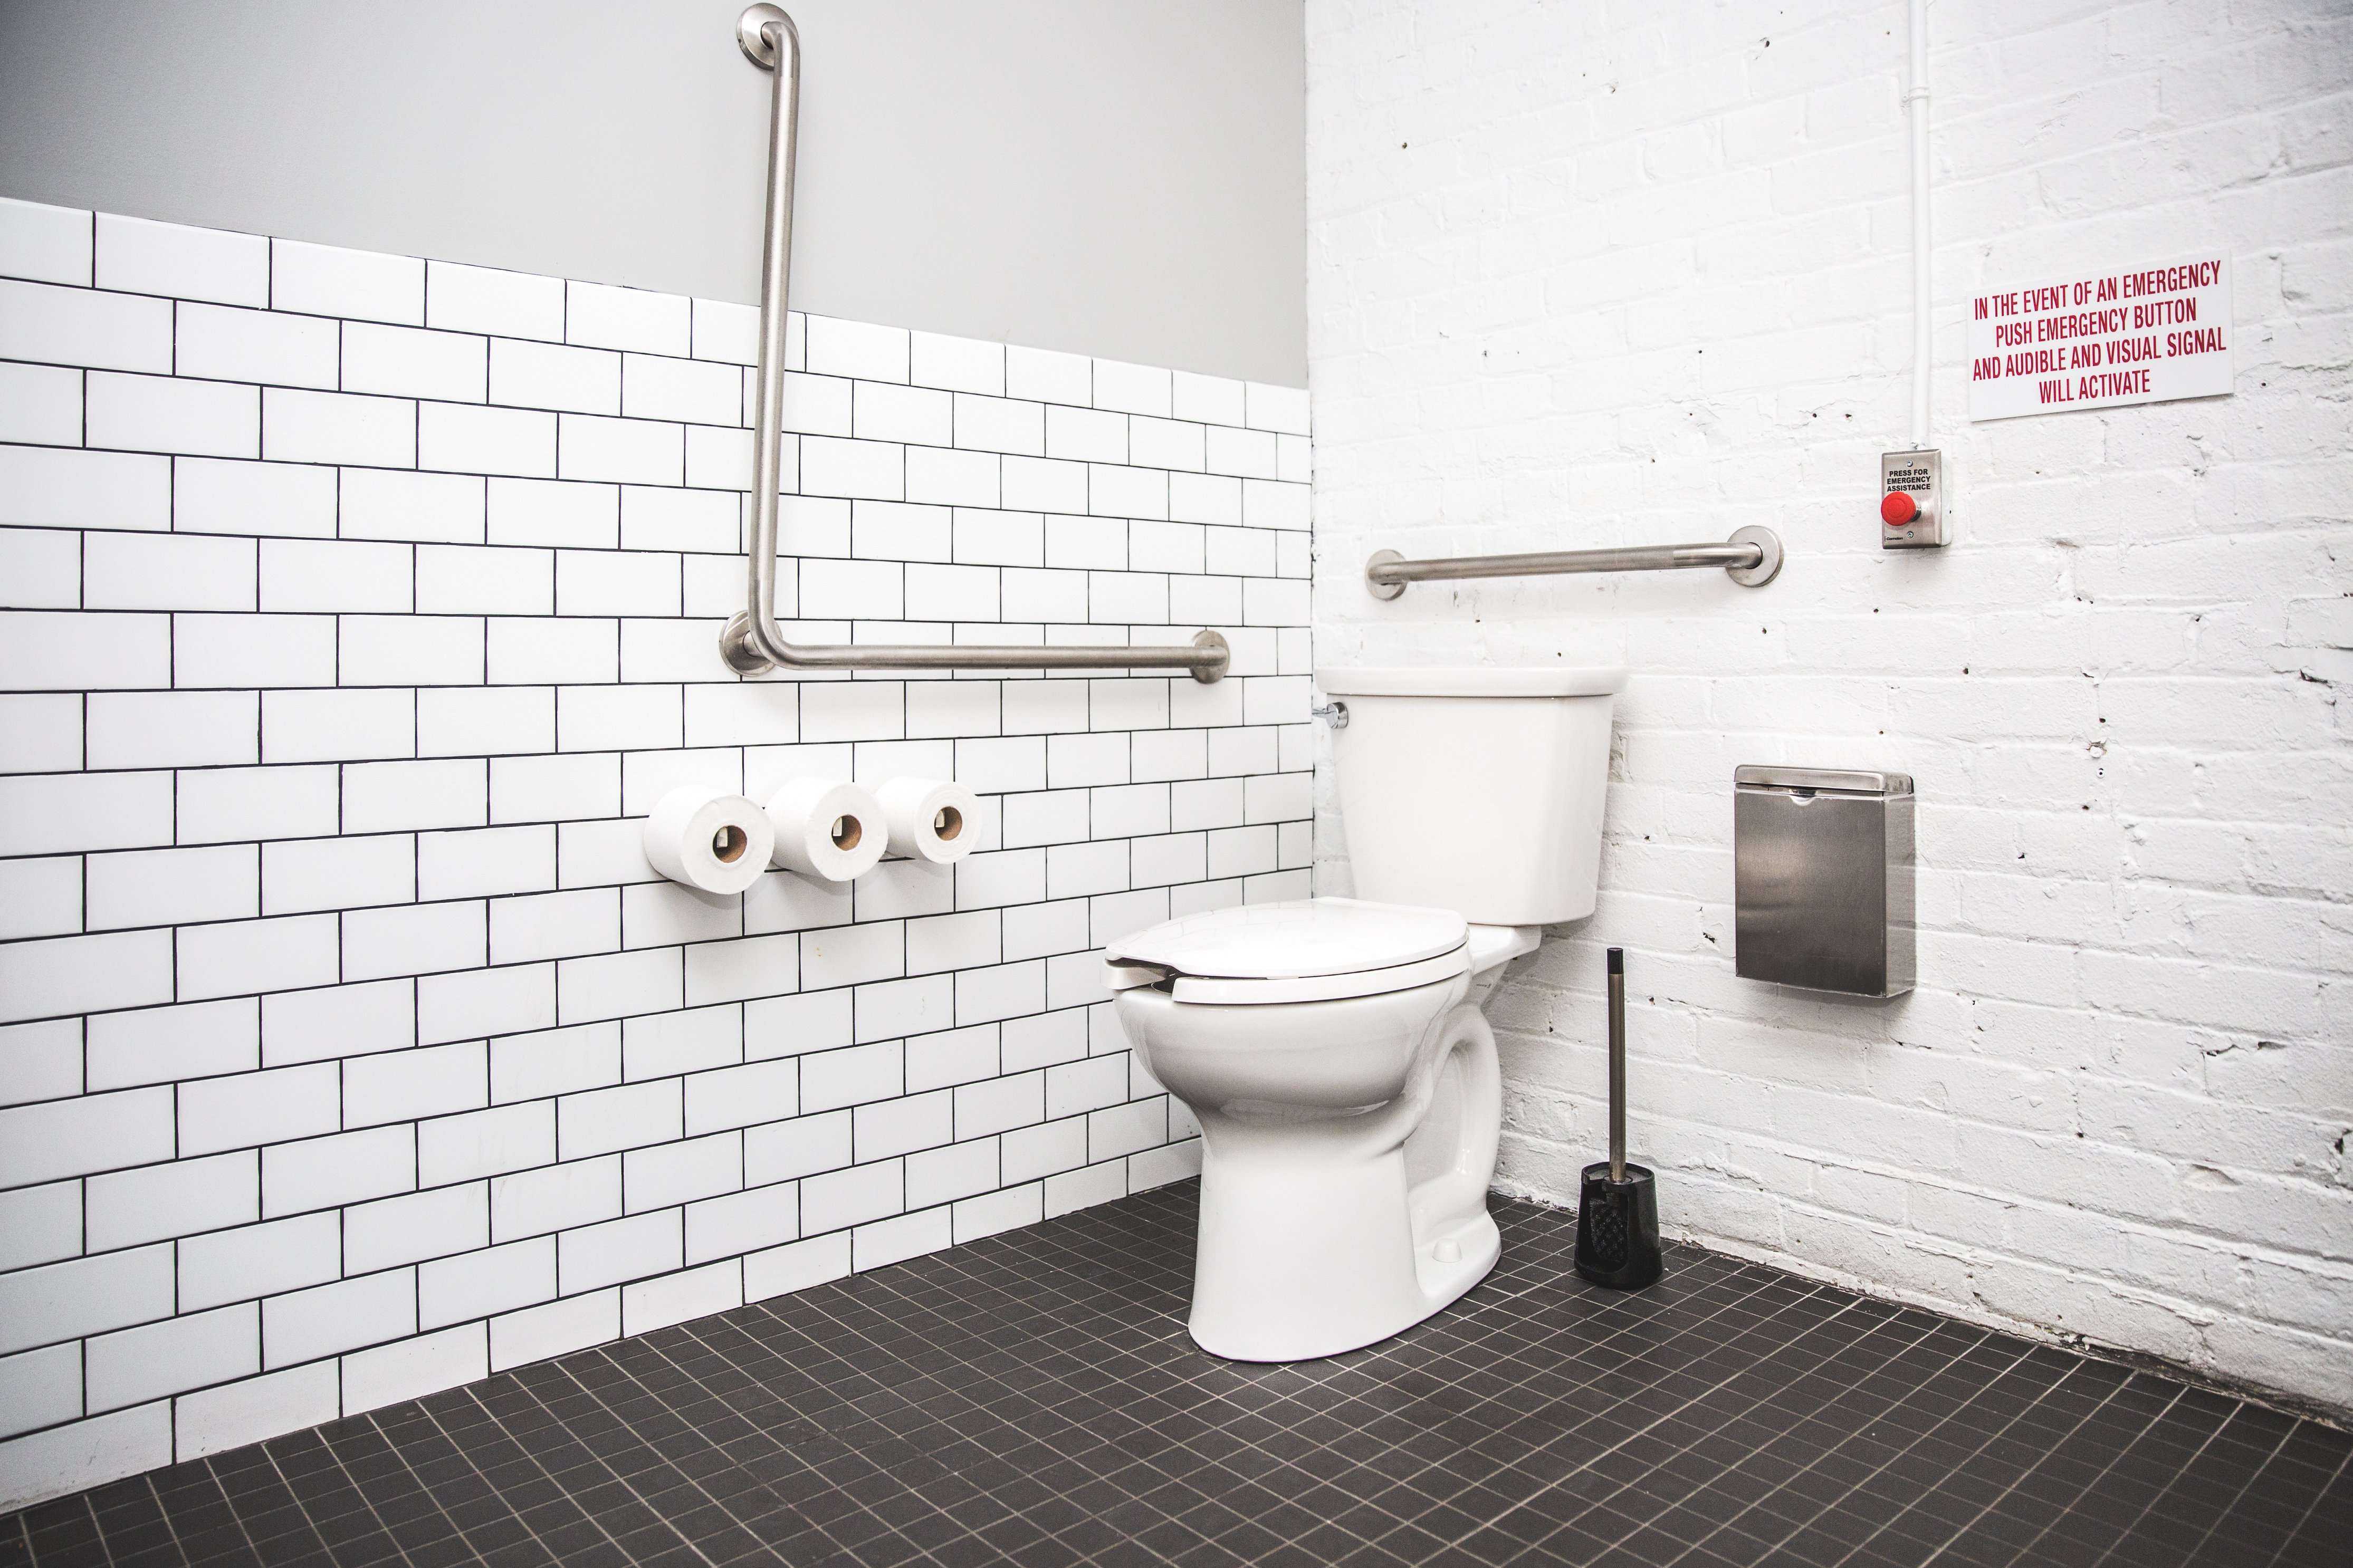 public-handicap-bathroom_4460x4460